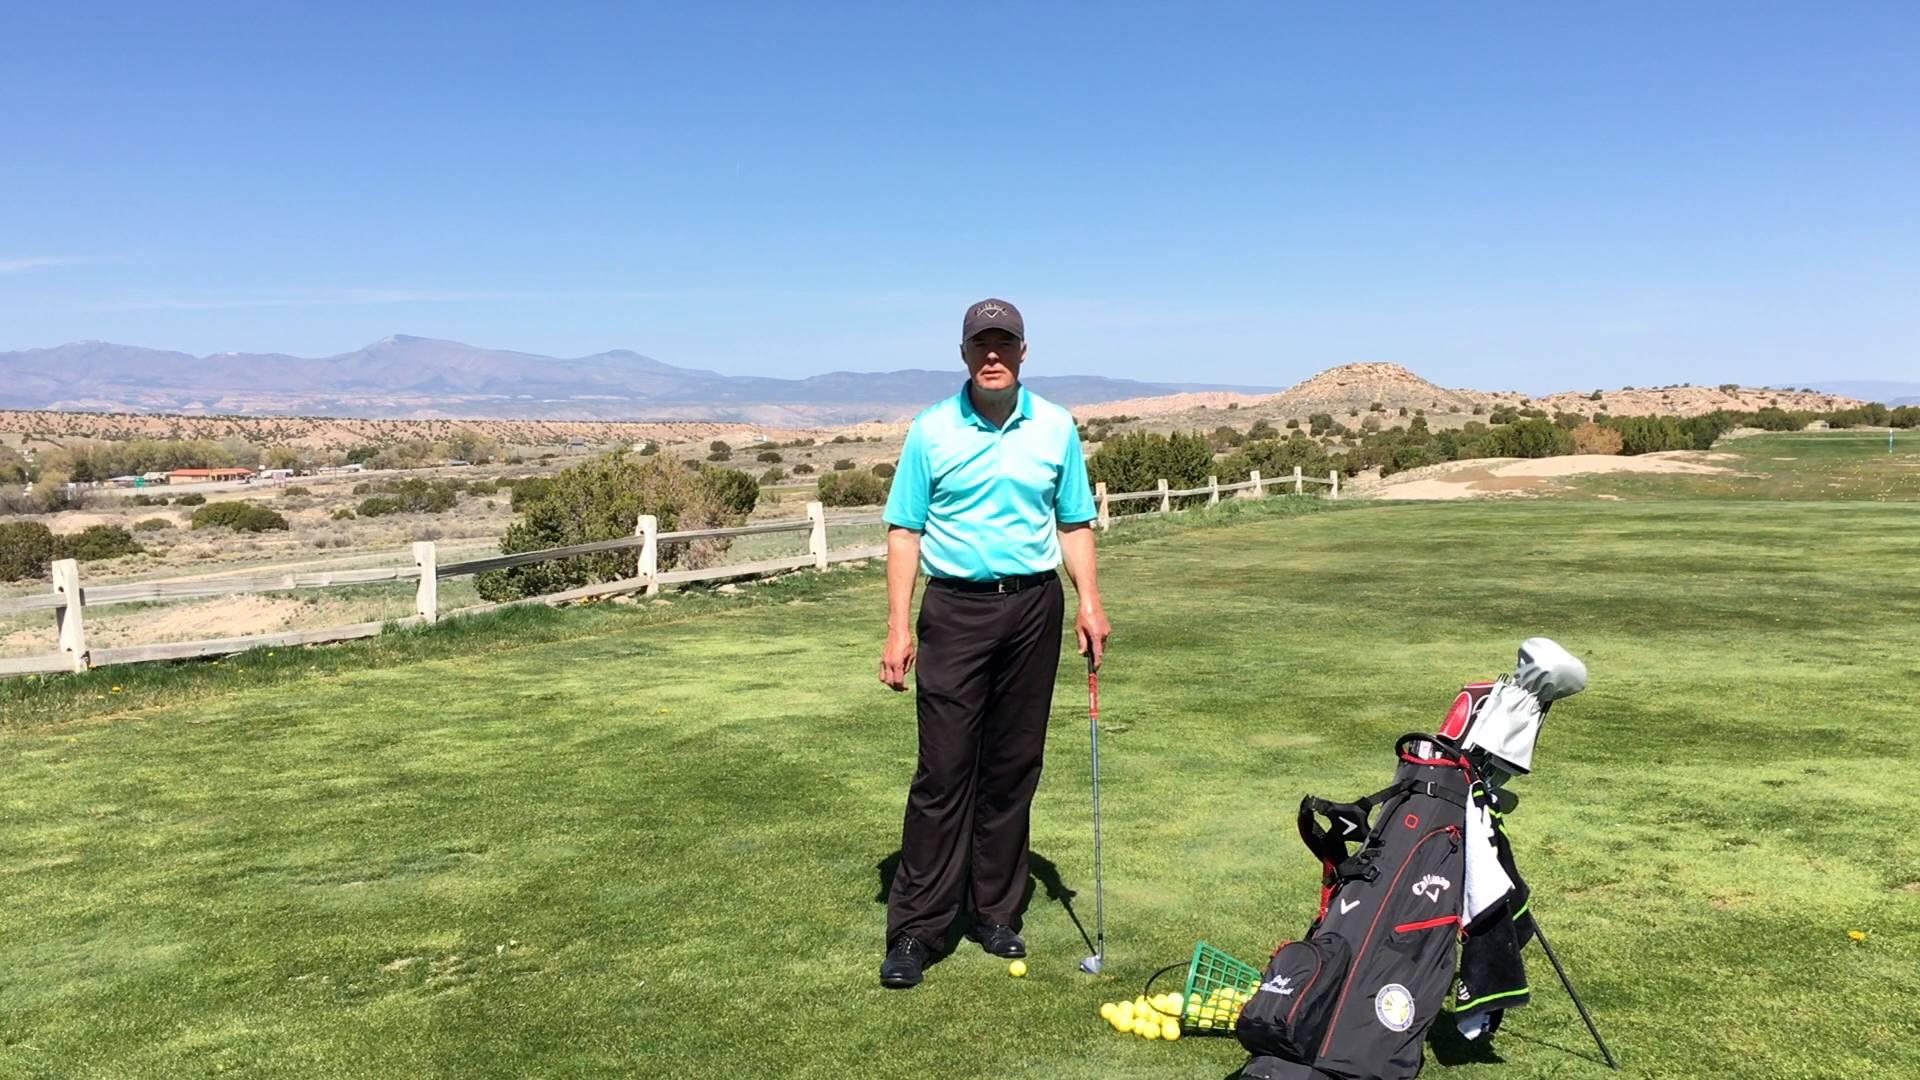 Golf Fundamentals for the Intermediate Golfer